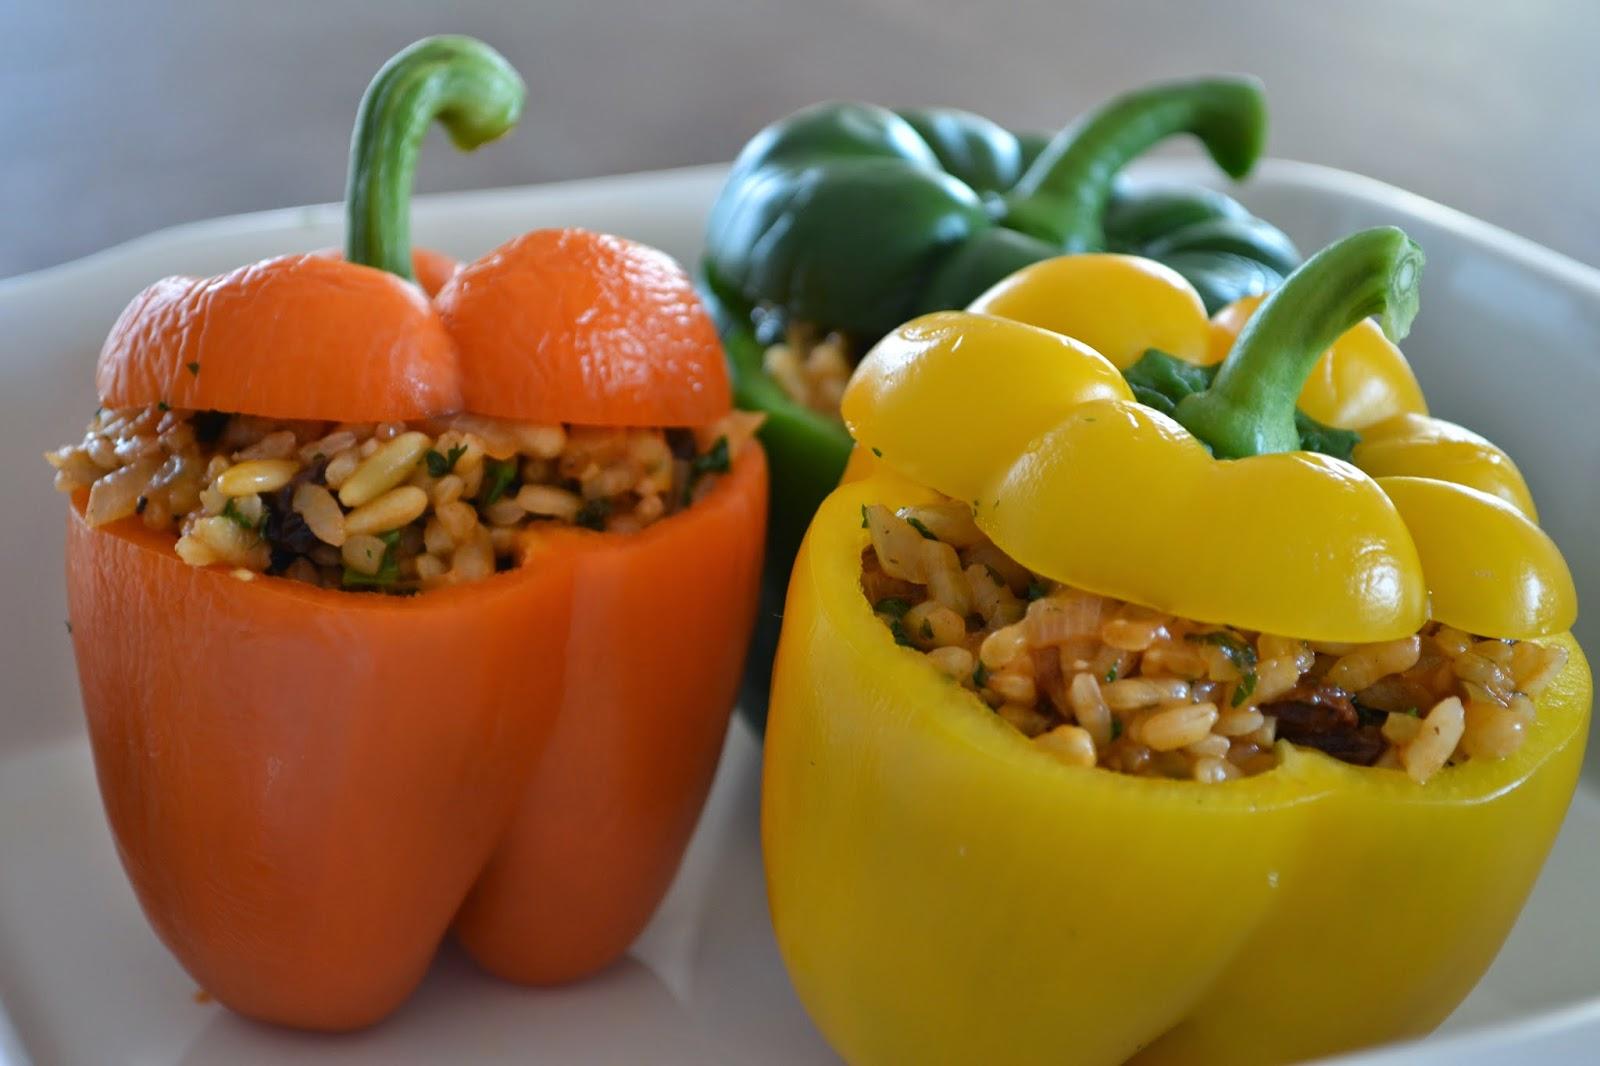 gevulde paprika vegetarisch rijst